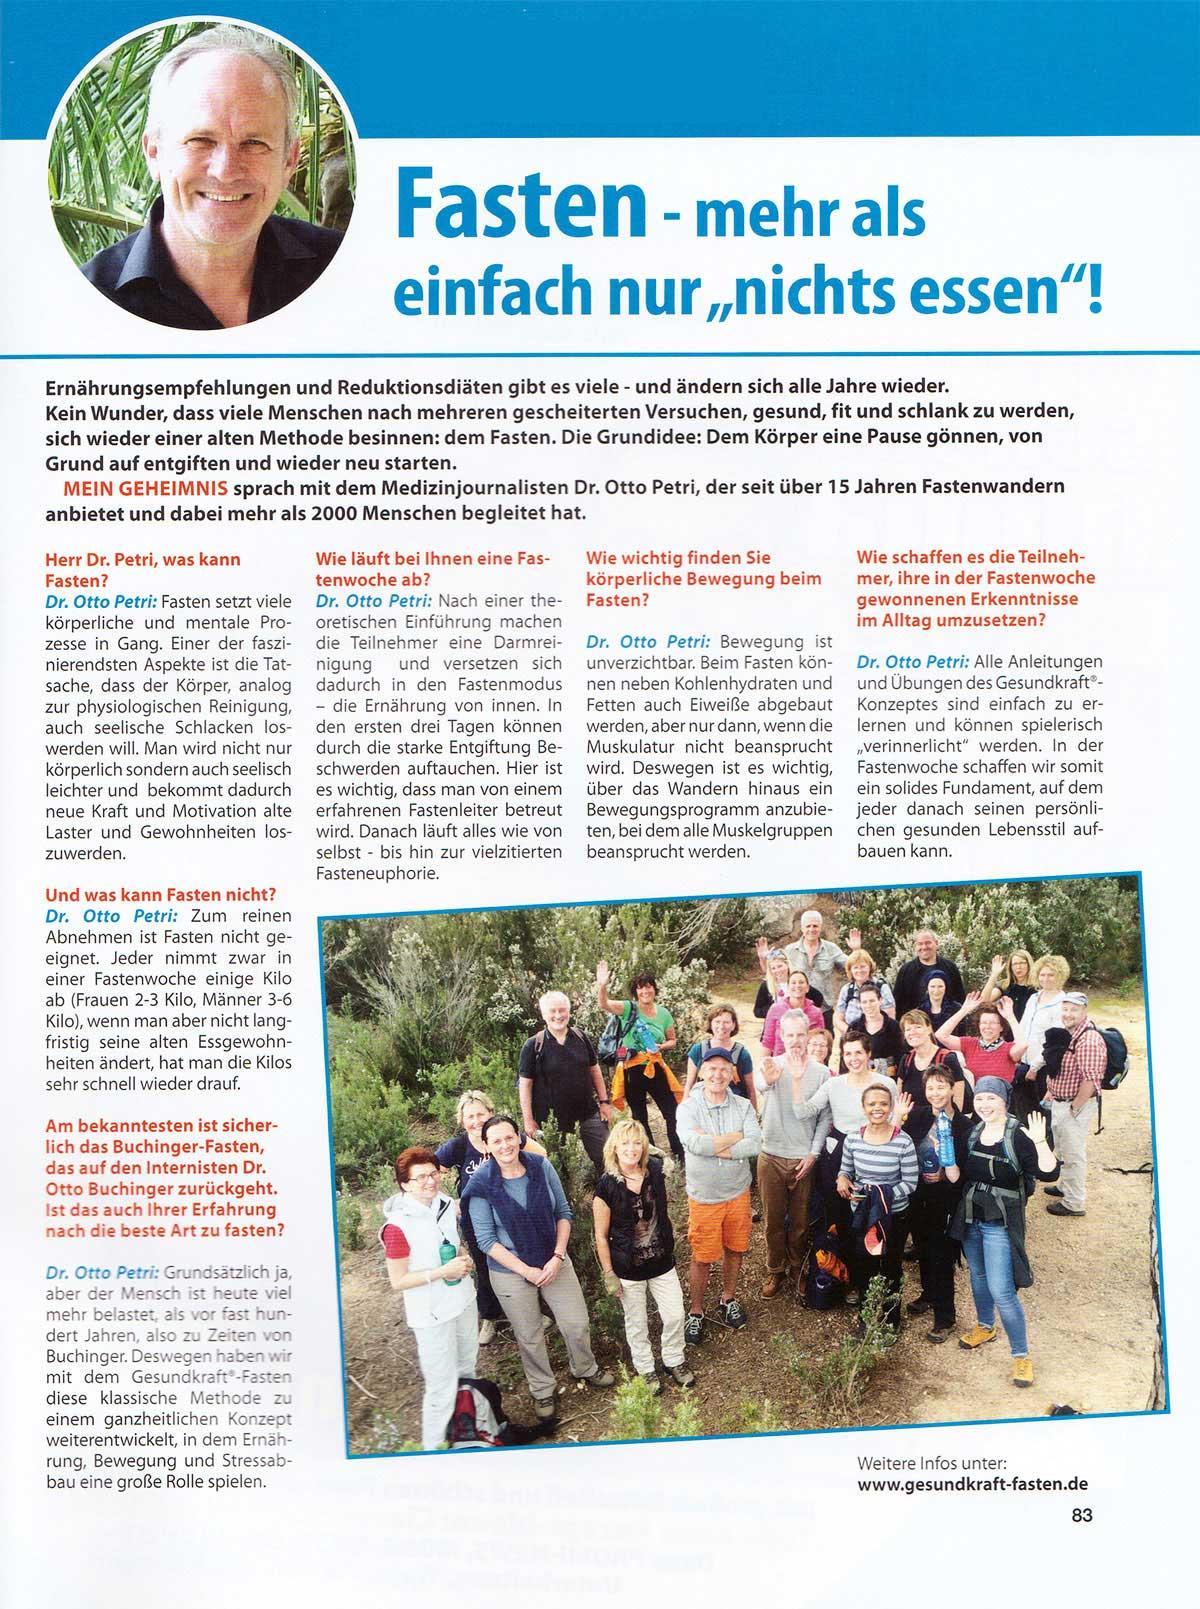 Fasten-Interview mit Dr. Otto Petri